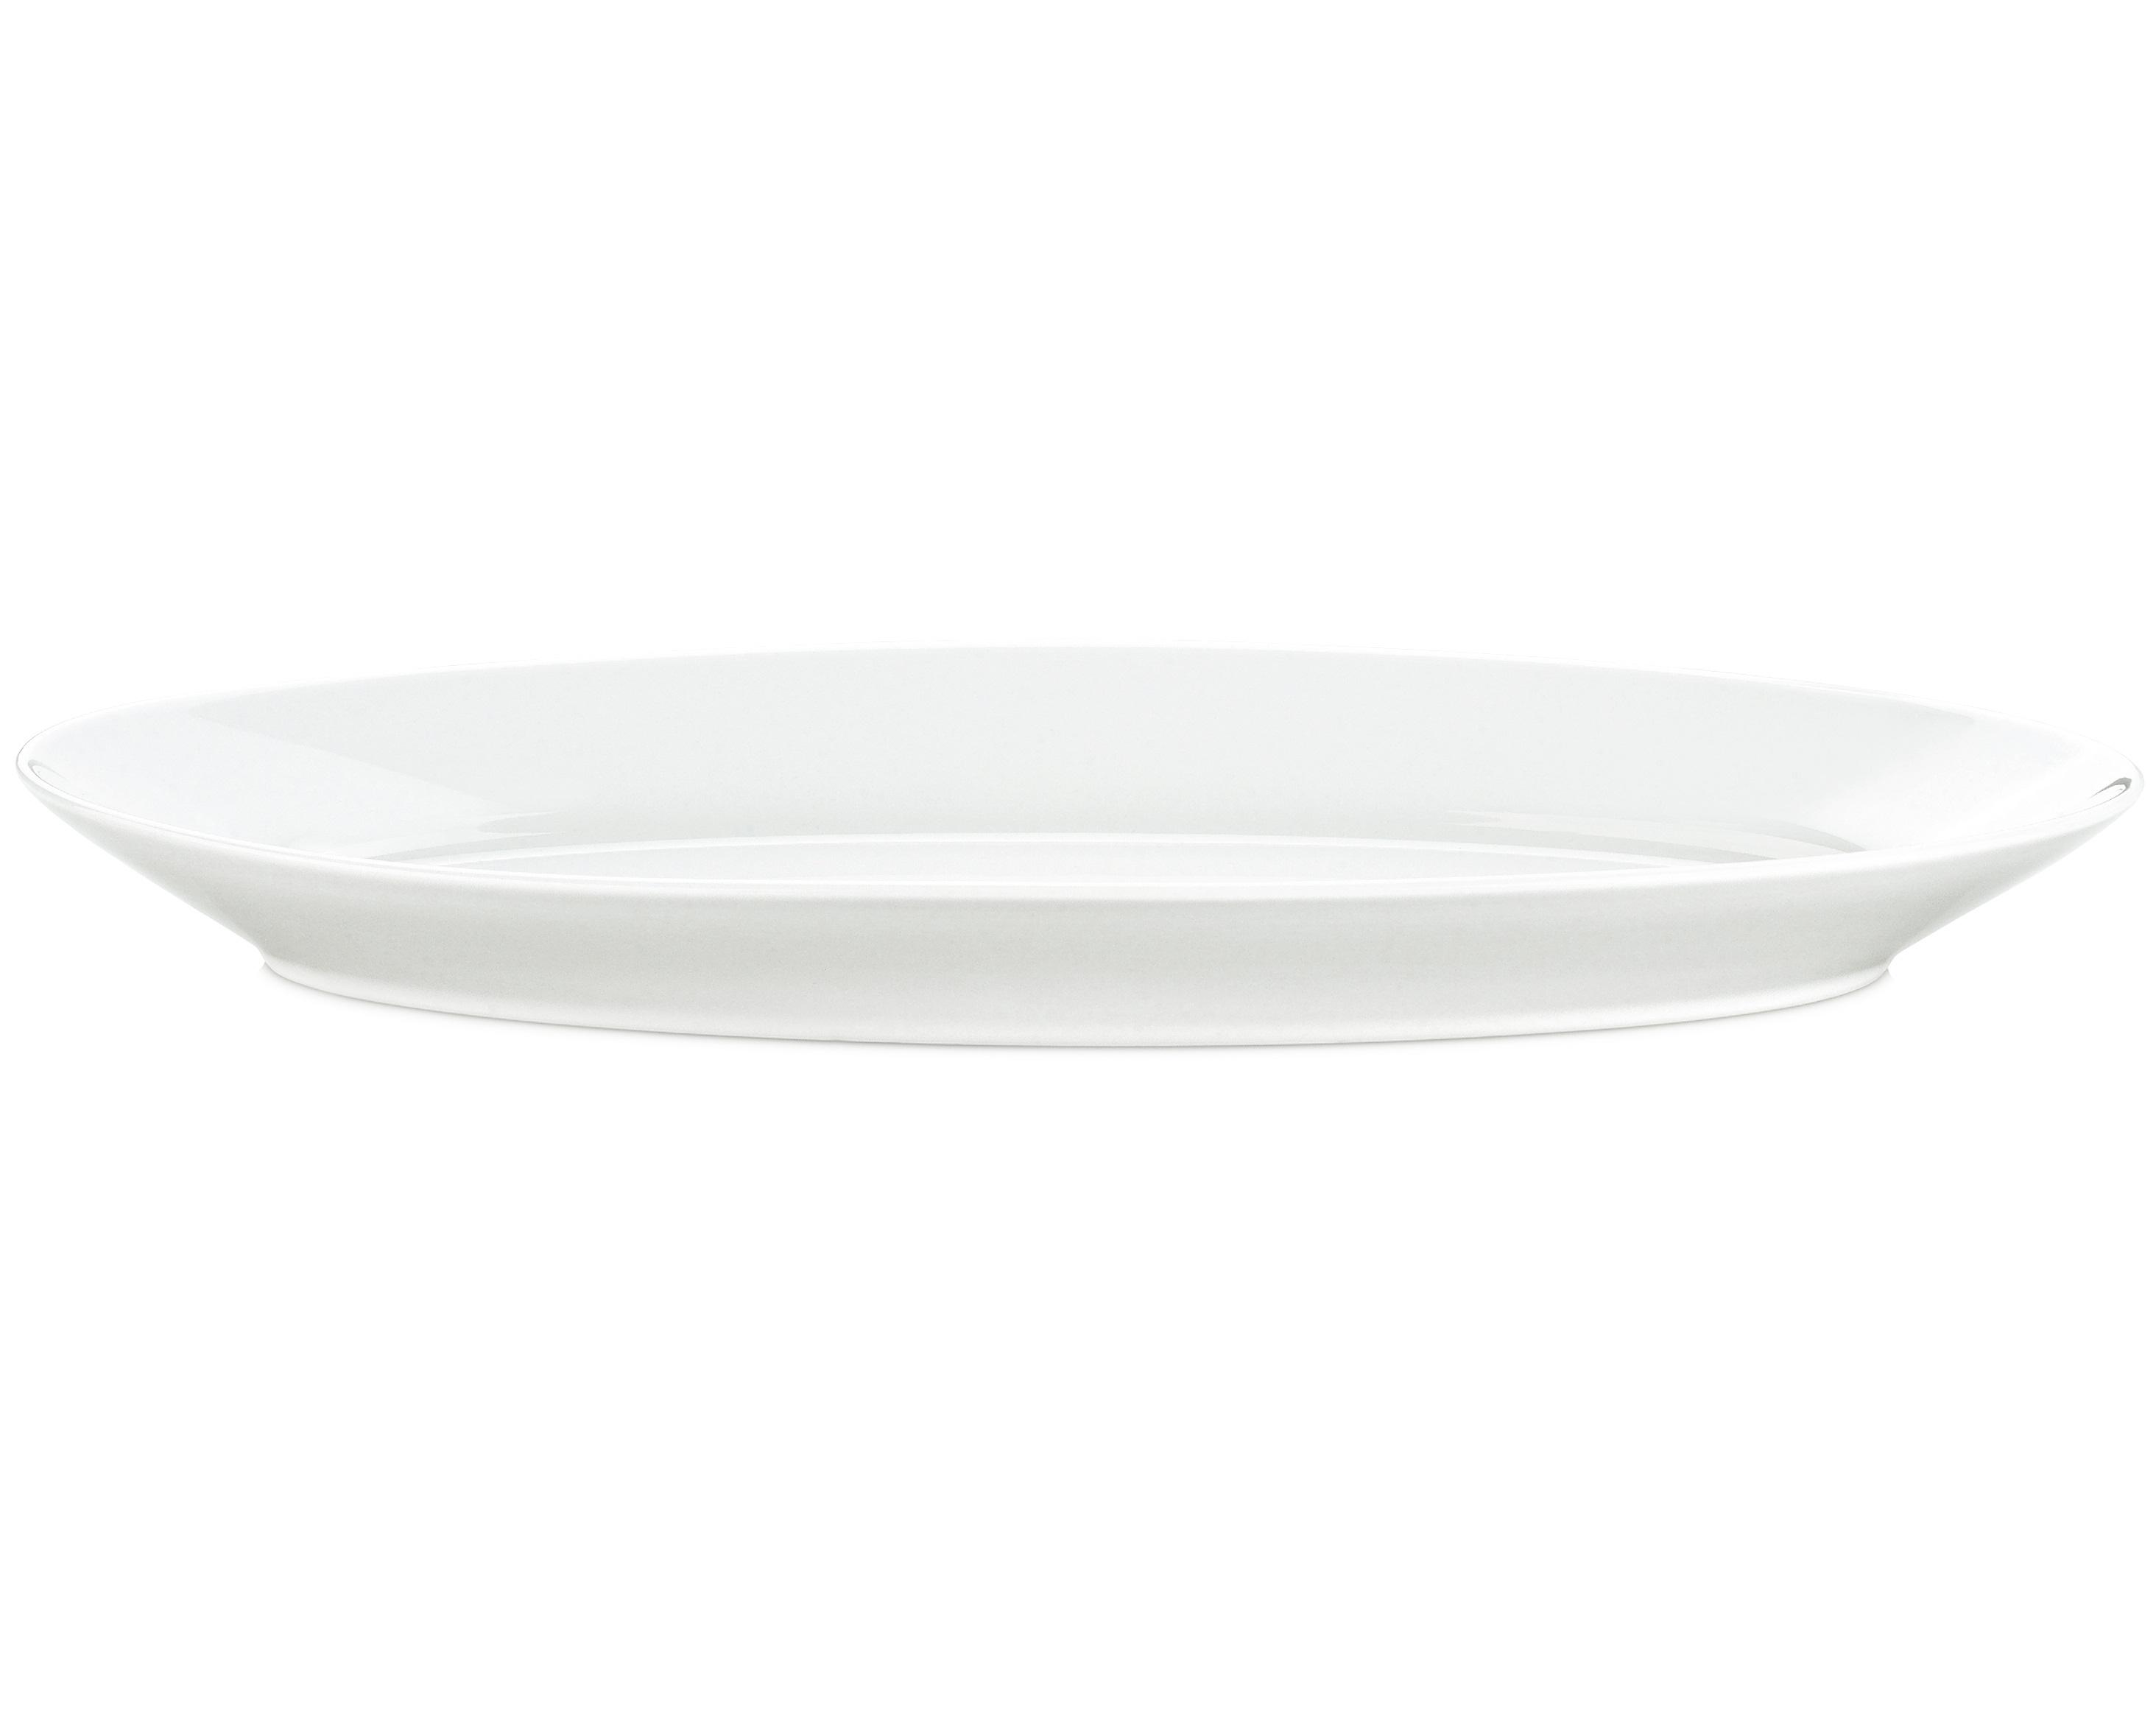 Pillivuyt - Fish Serving Dish 58 cm - White (240157)